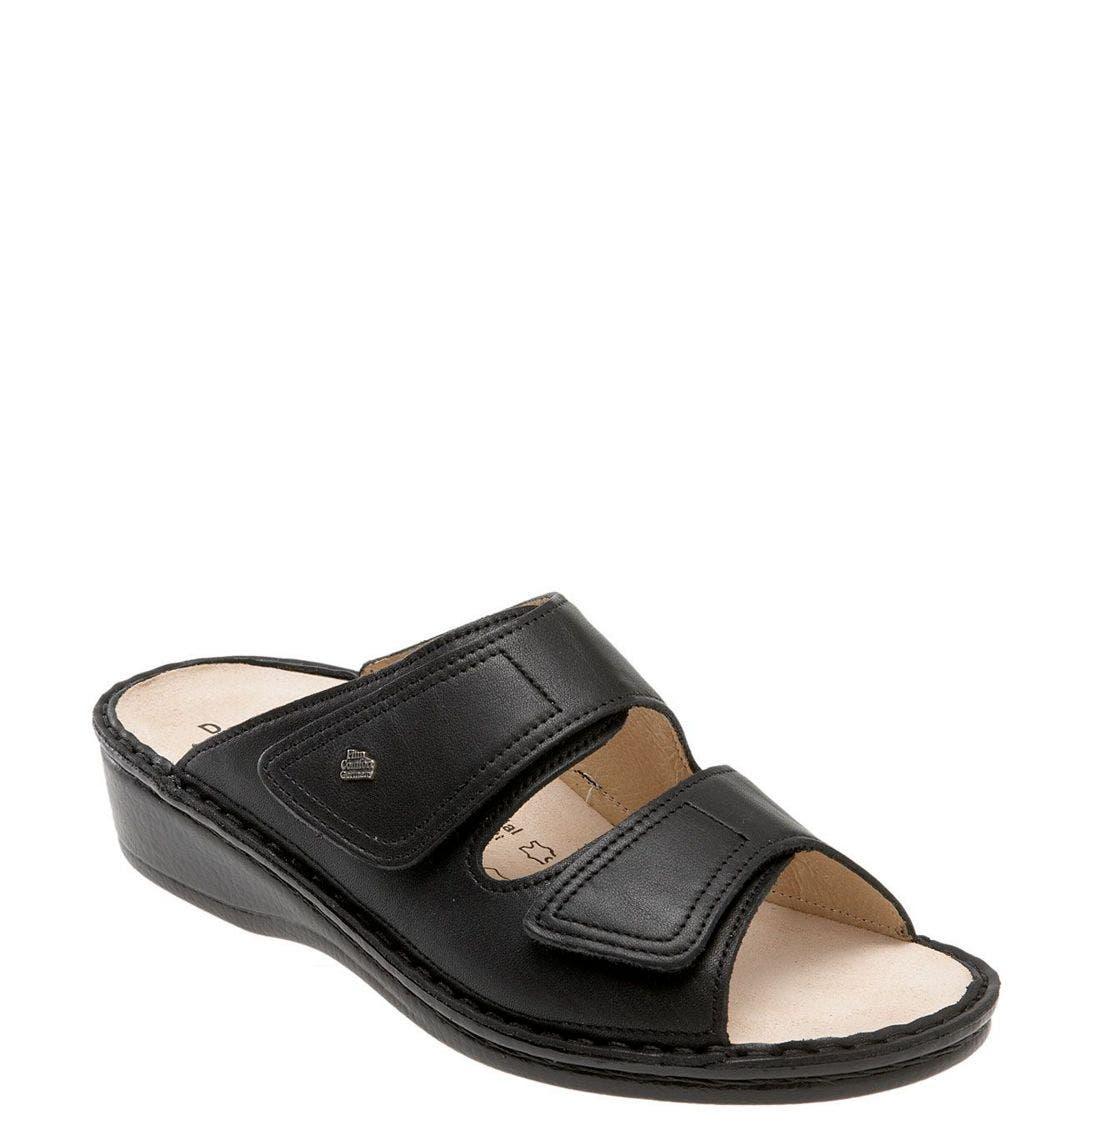 'Jamaica' Sandal,                             Main thumbnail 1, color,                             BLACK NAPPA